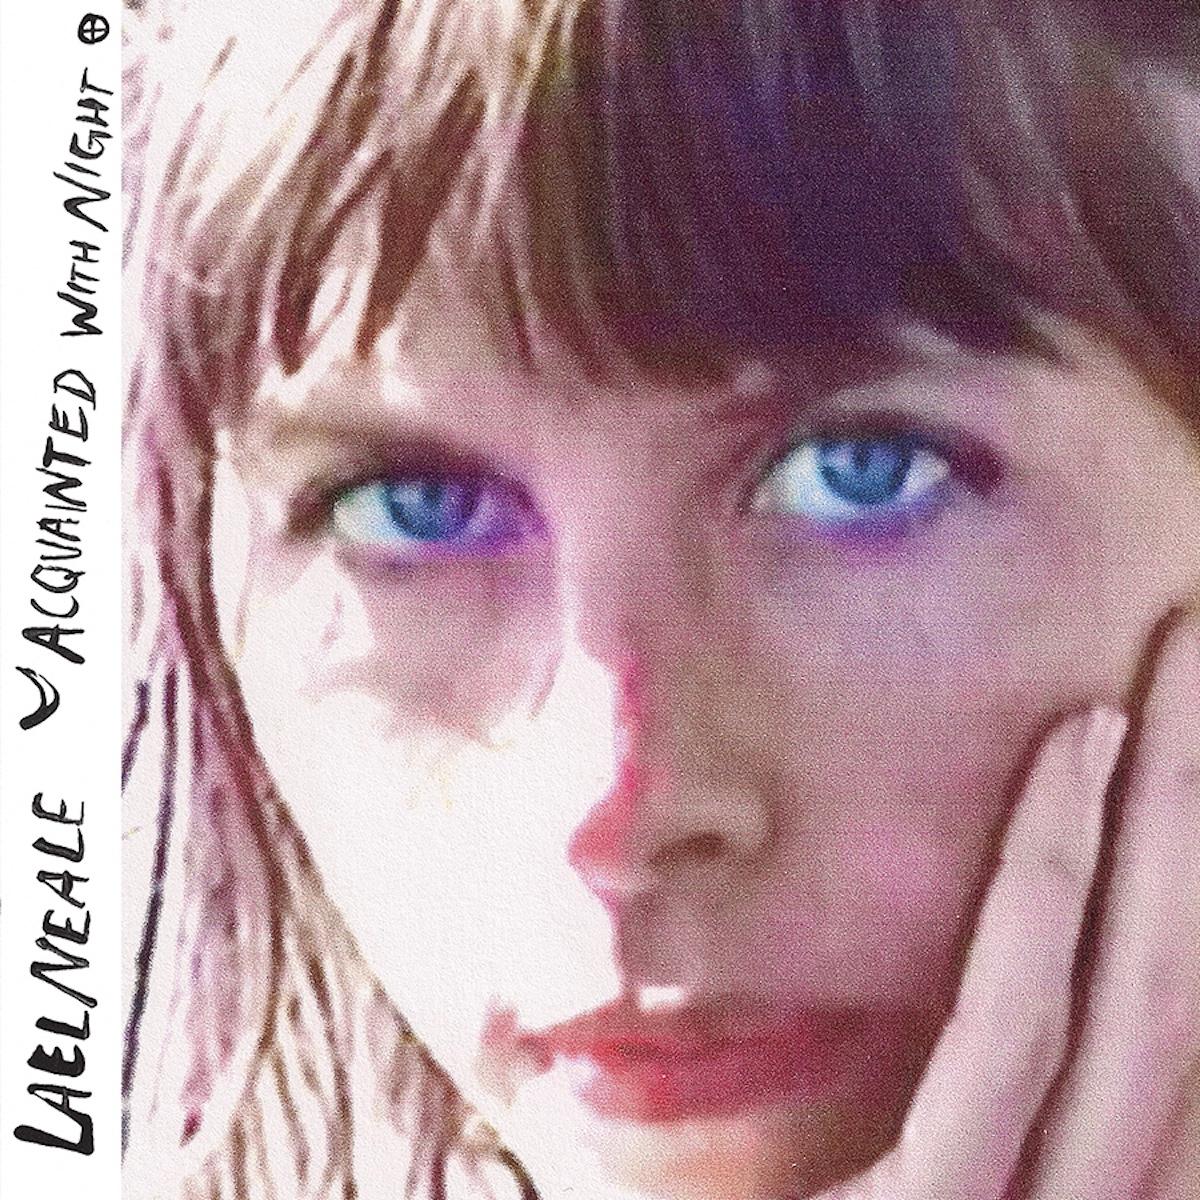 Lael Neale acquainted with night album artwork cover blue vein